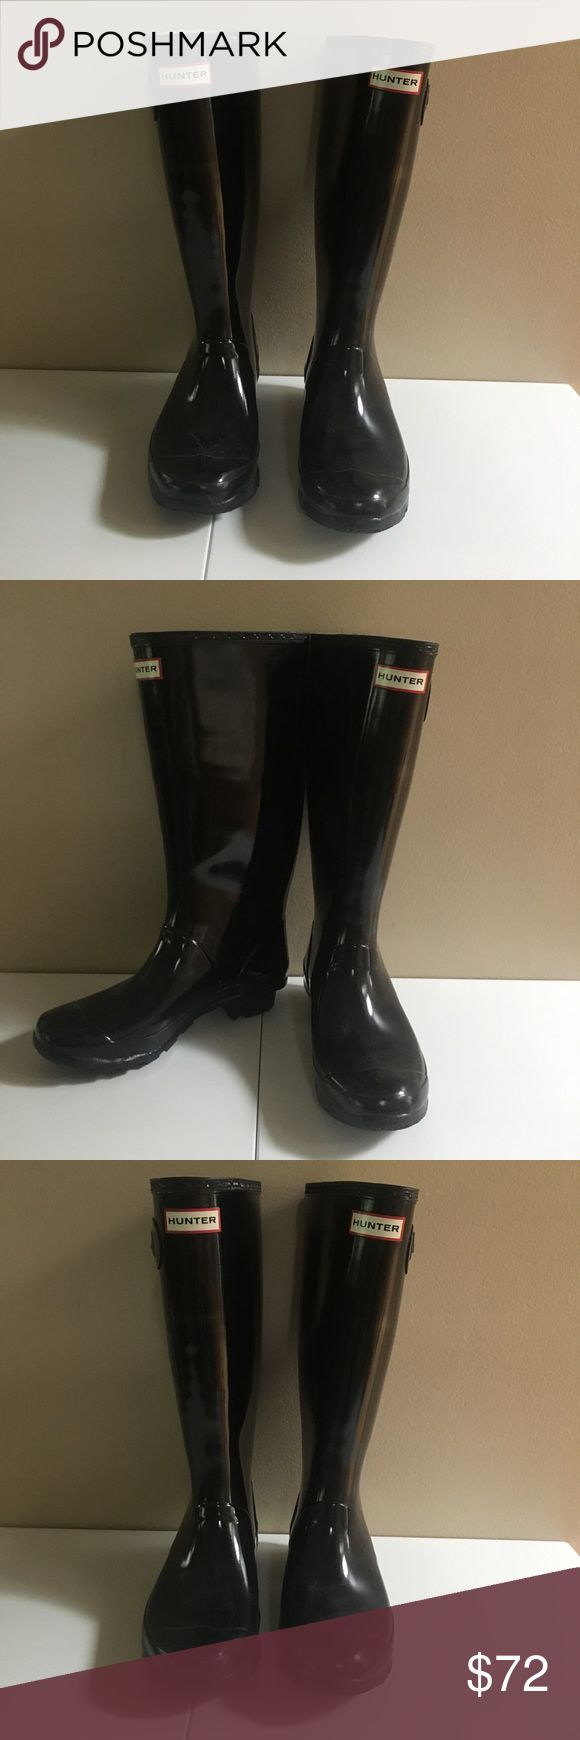 Black Original Hunter Gloss Rain Boots Black Original Gloss Hunter Boots men's size 6, women's size 7. In excellent condition. Hunter Boots Shoes Winter & Rain Boots